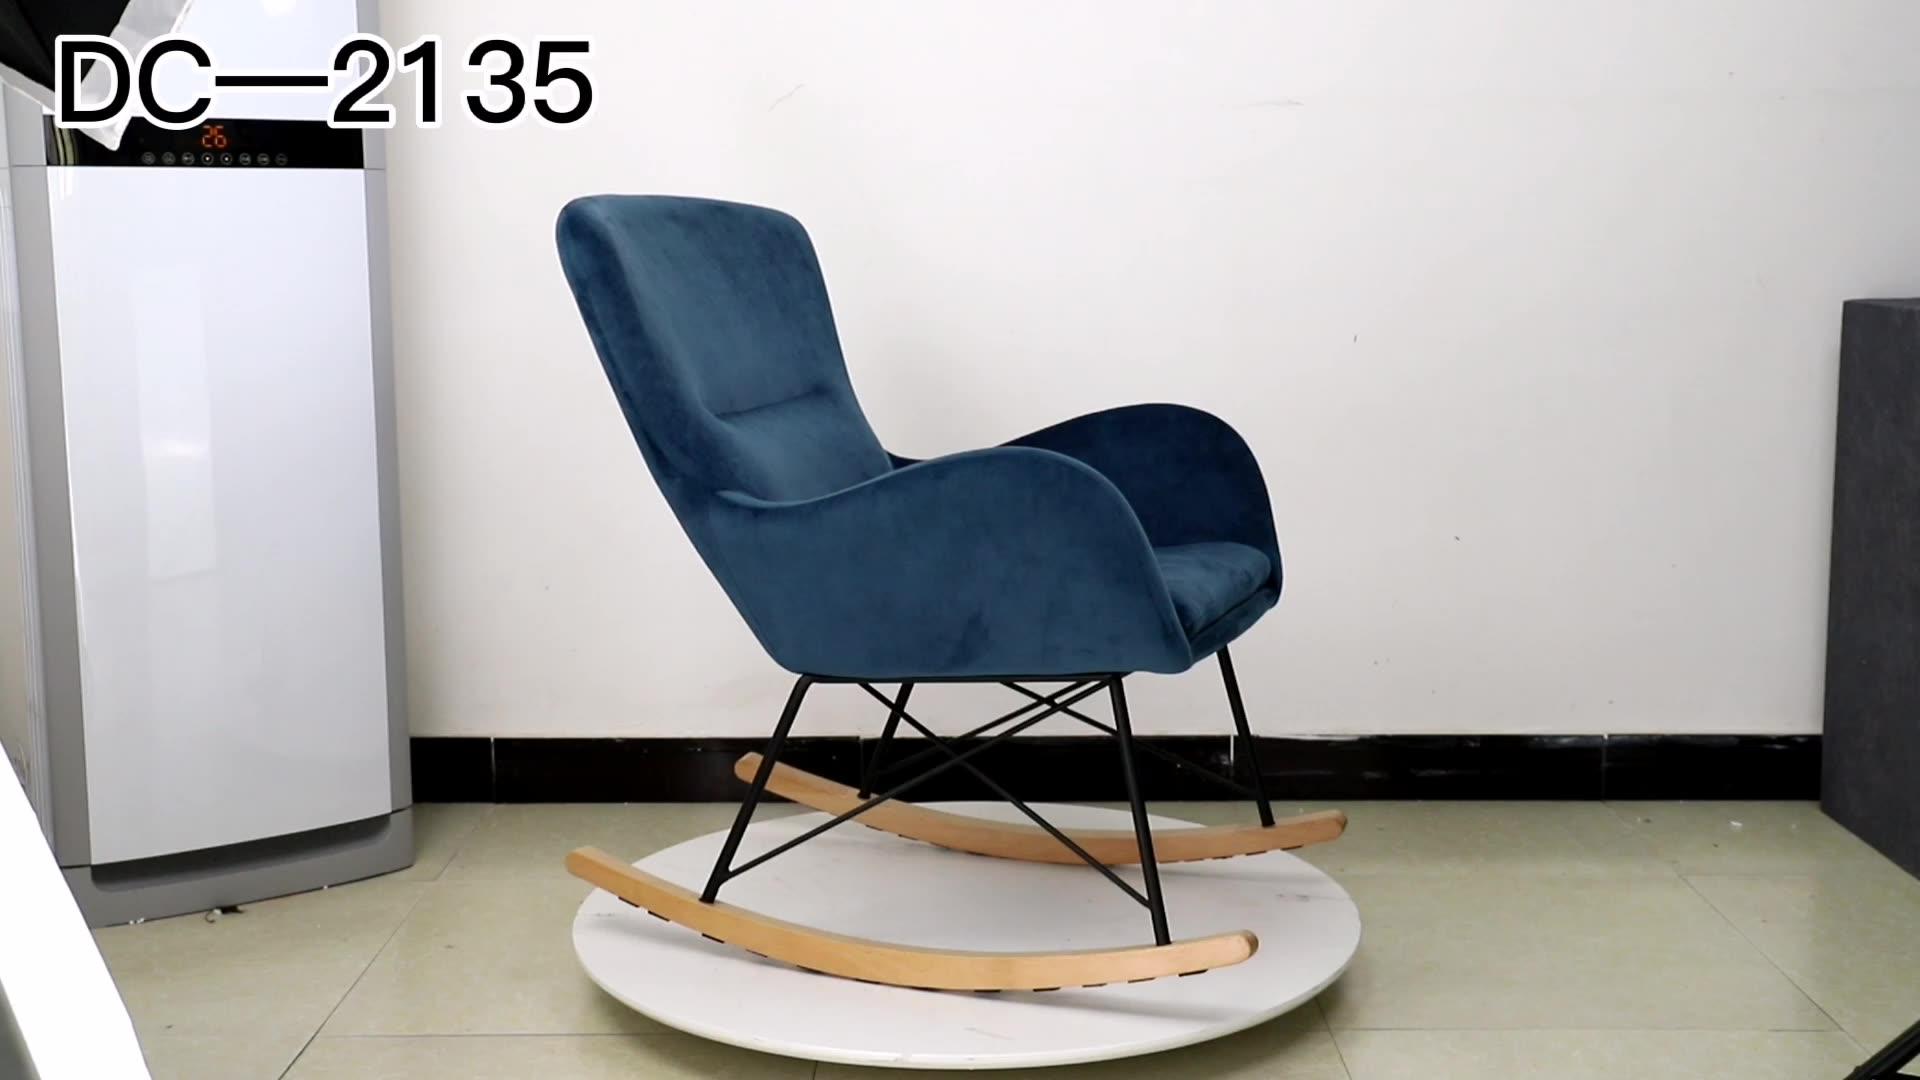 Blue Velvet Fabric Upholstered Soft Seat Beech Solid Wood Frame Rocking Chair Living Room Furniture